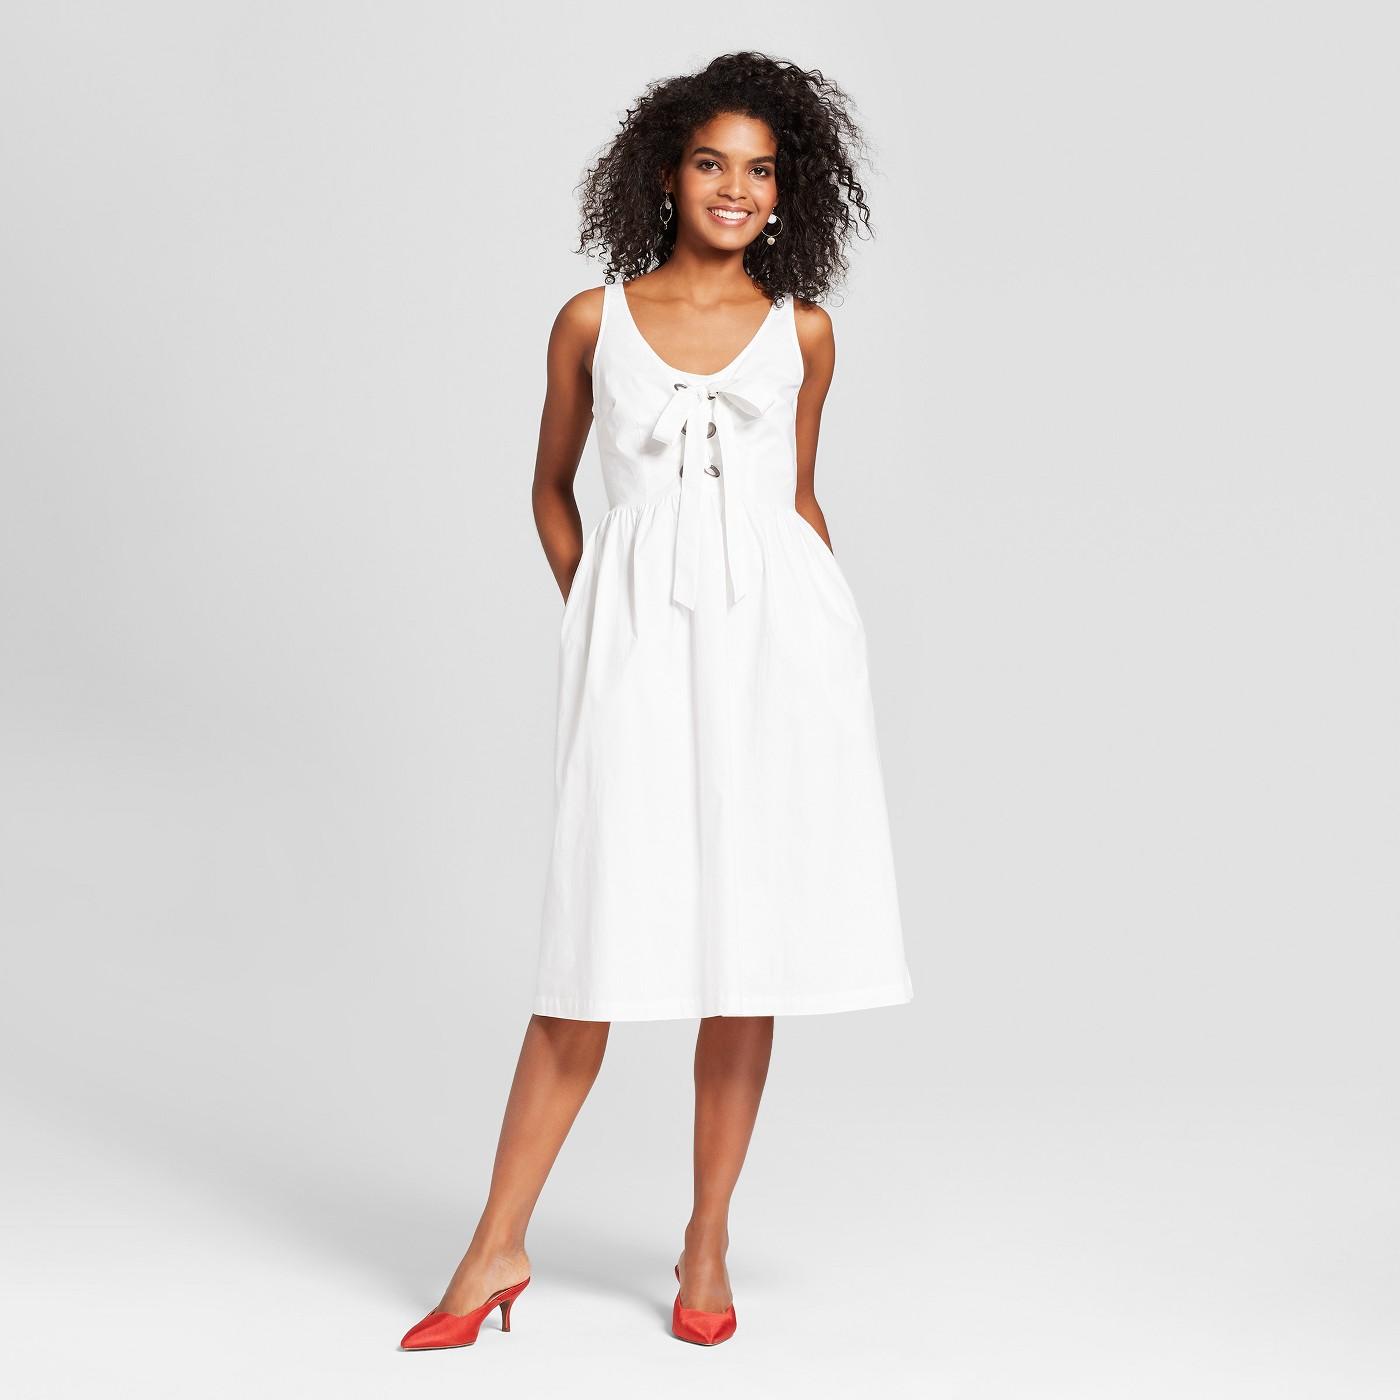 Target lace-up dress